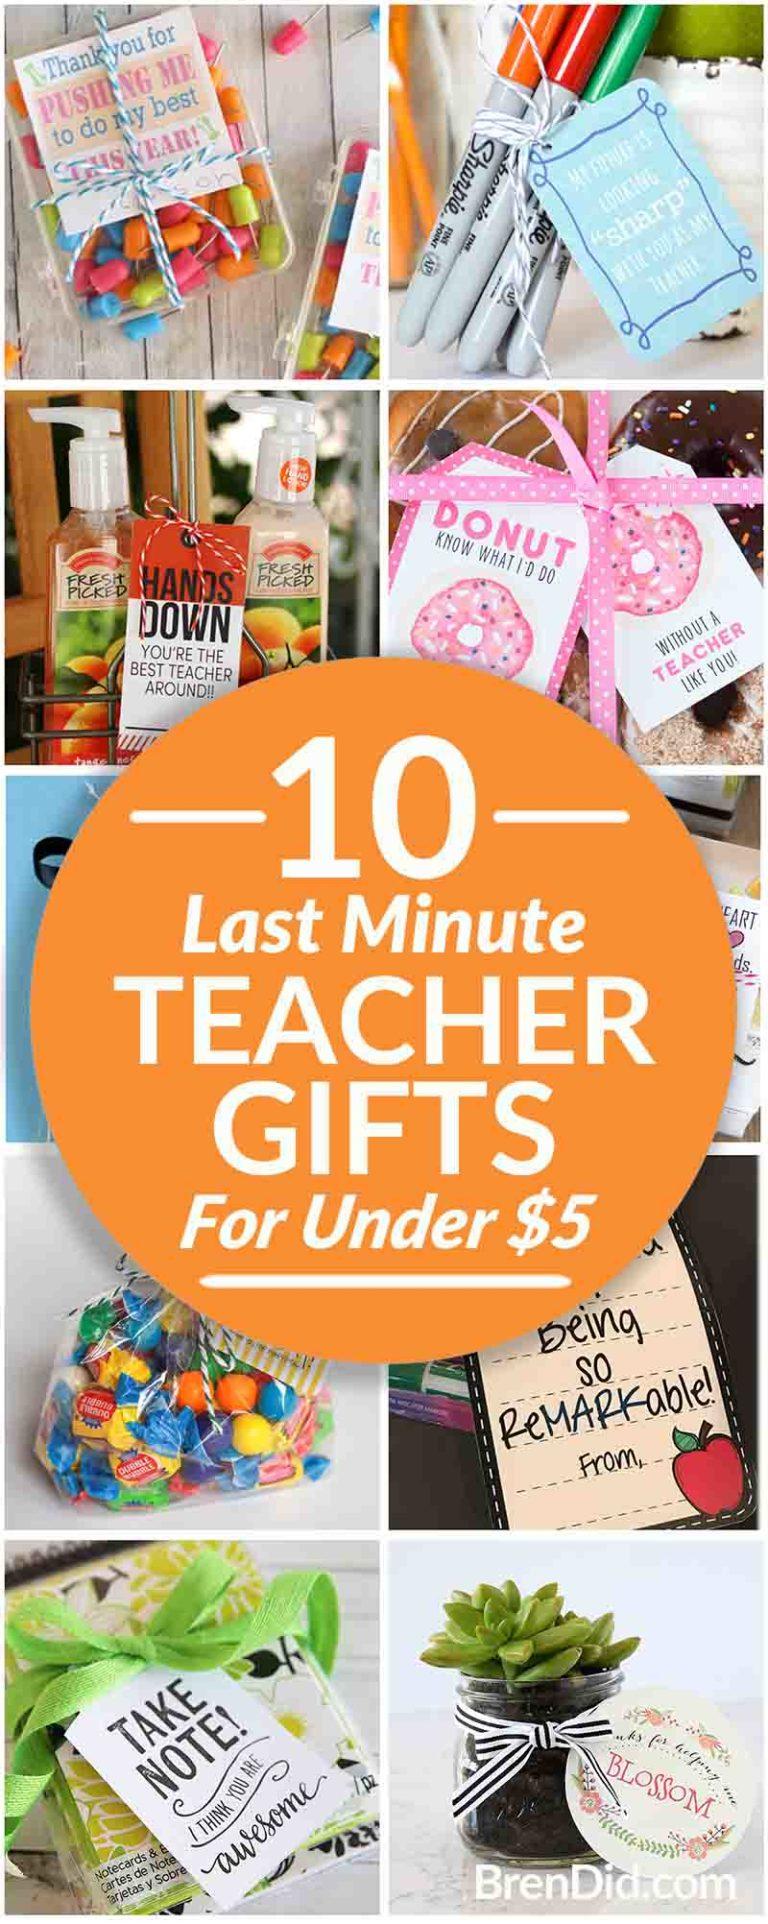 Last Minute Teacher Gifts pin